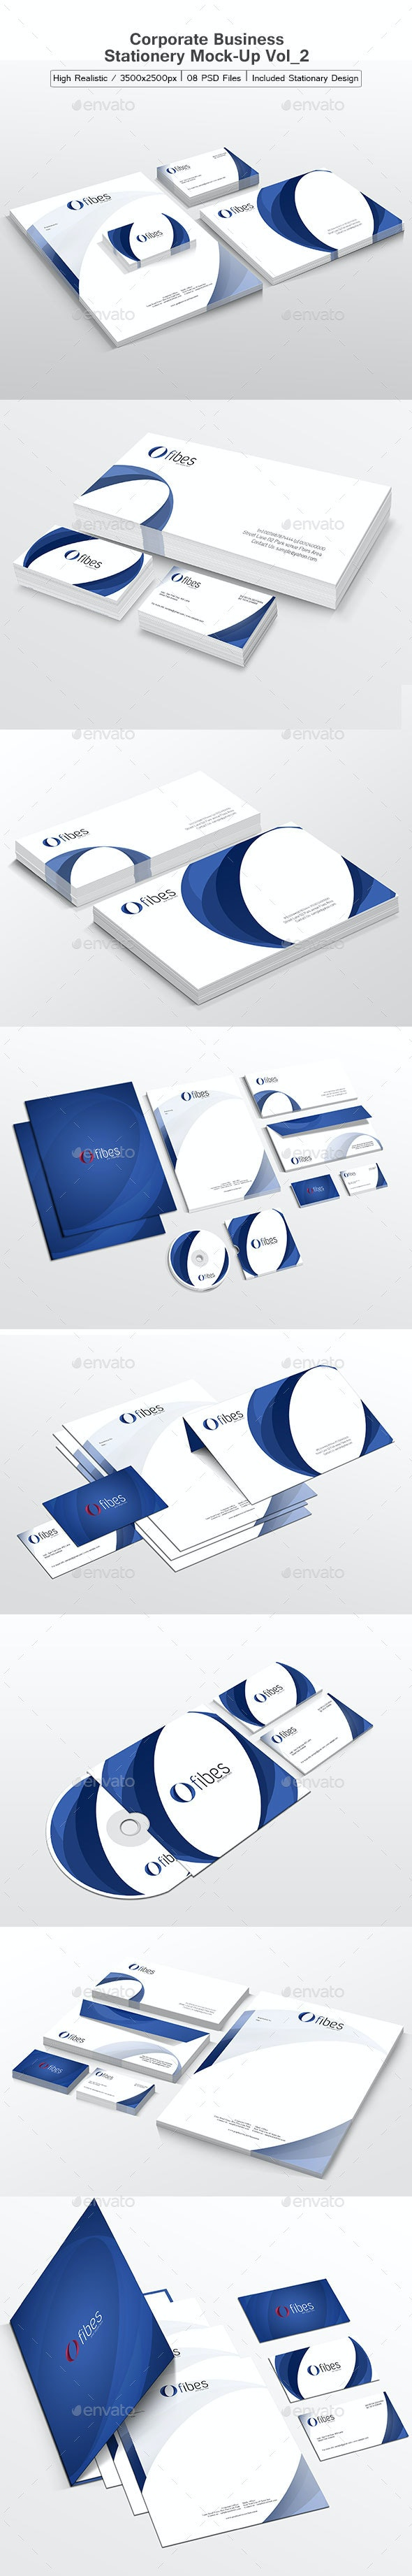 Corporate/Business Stationery Mock-Up Vol_2 - Stationery Print